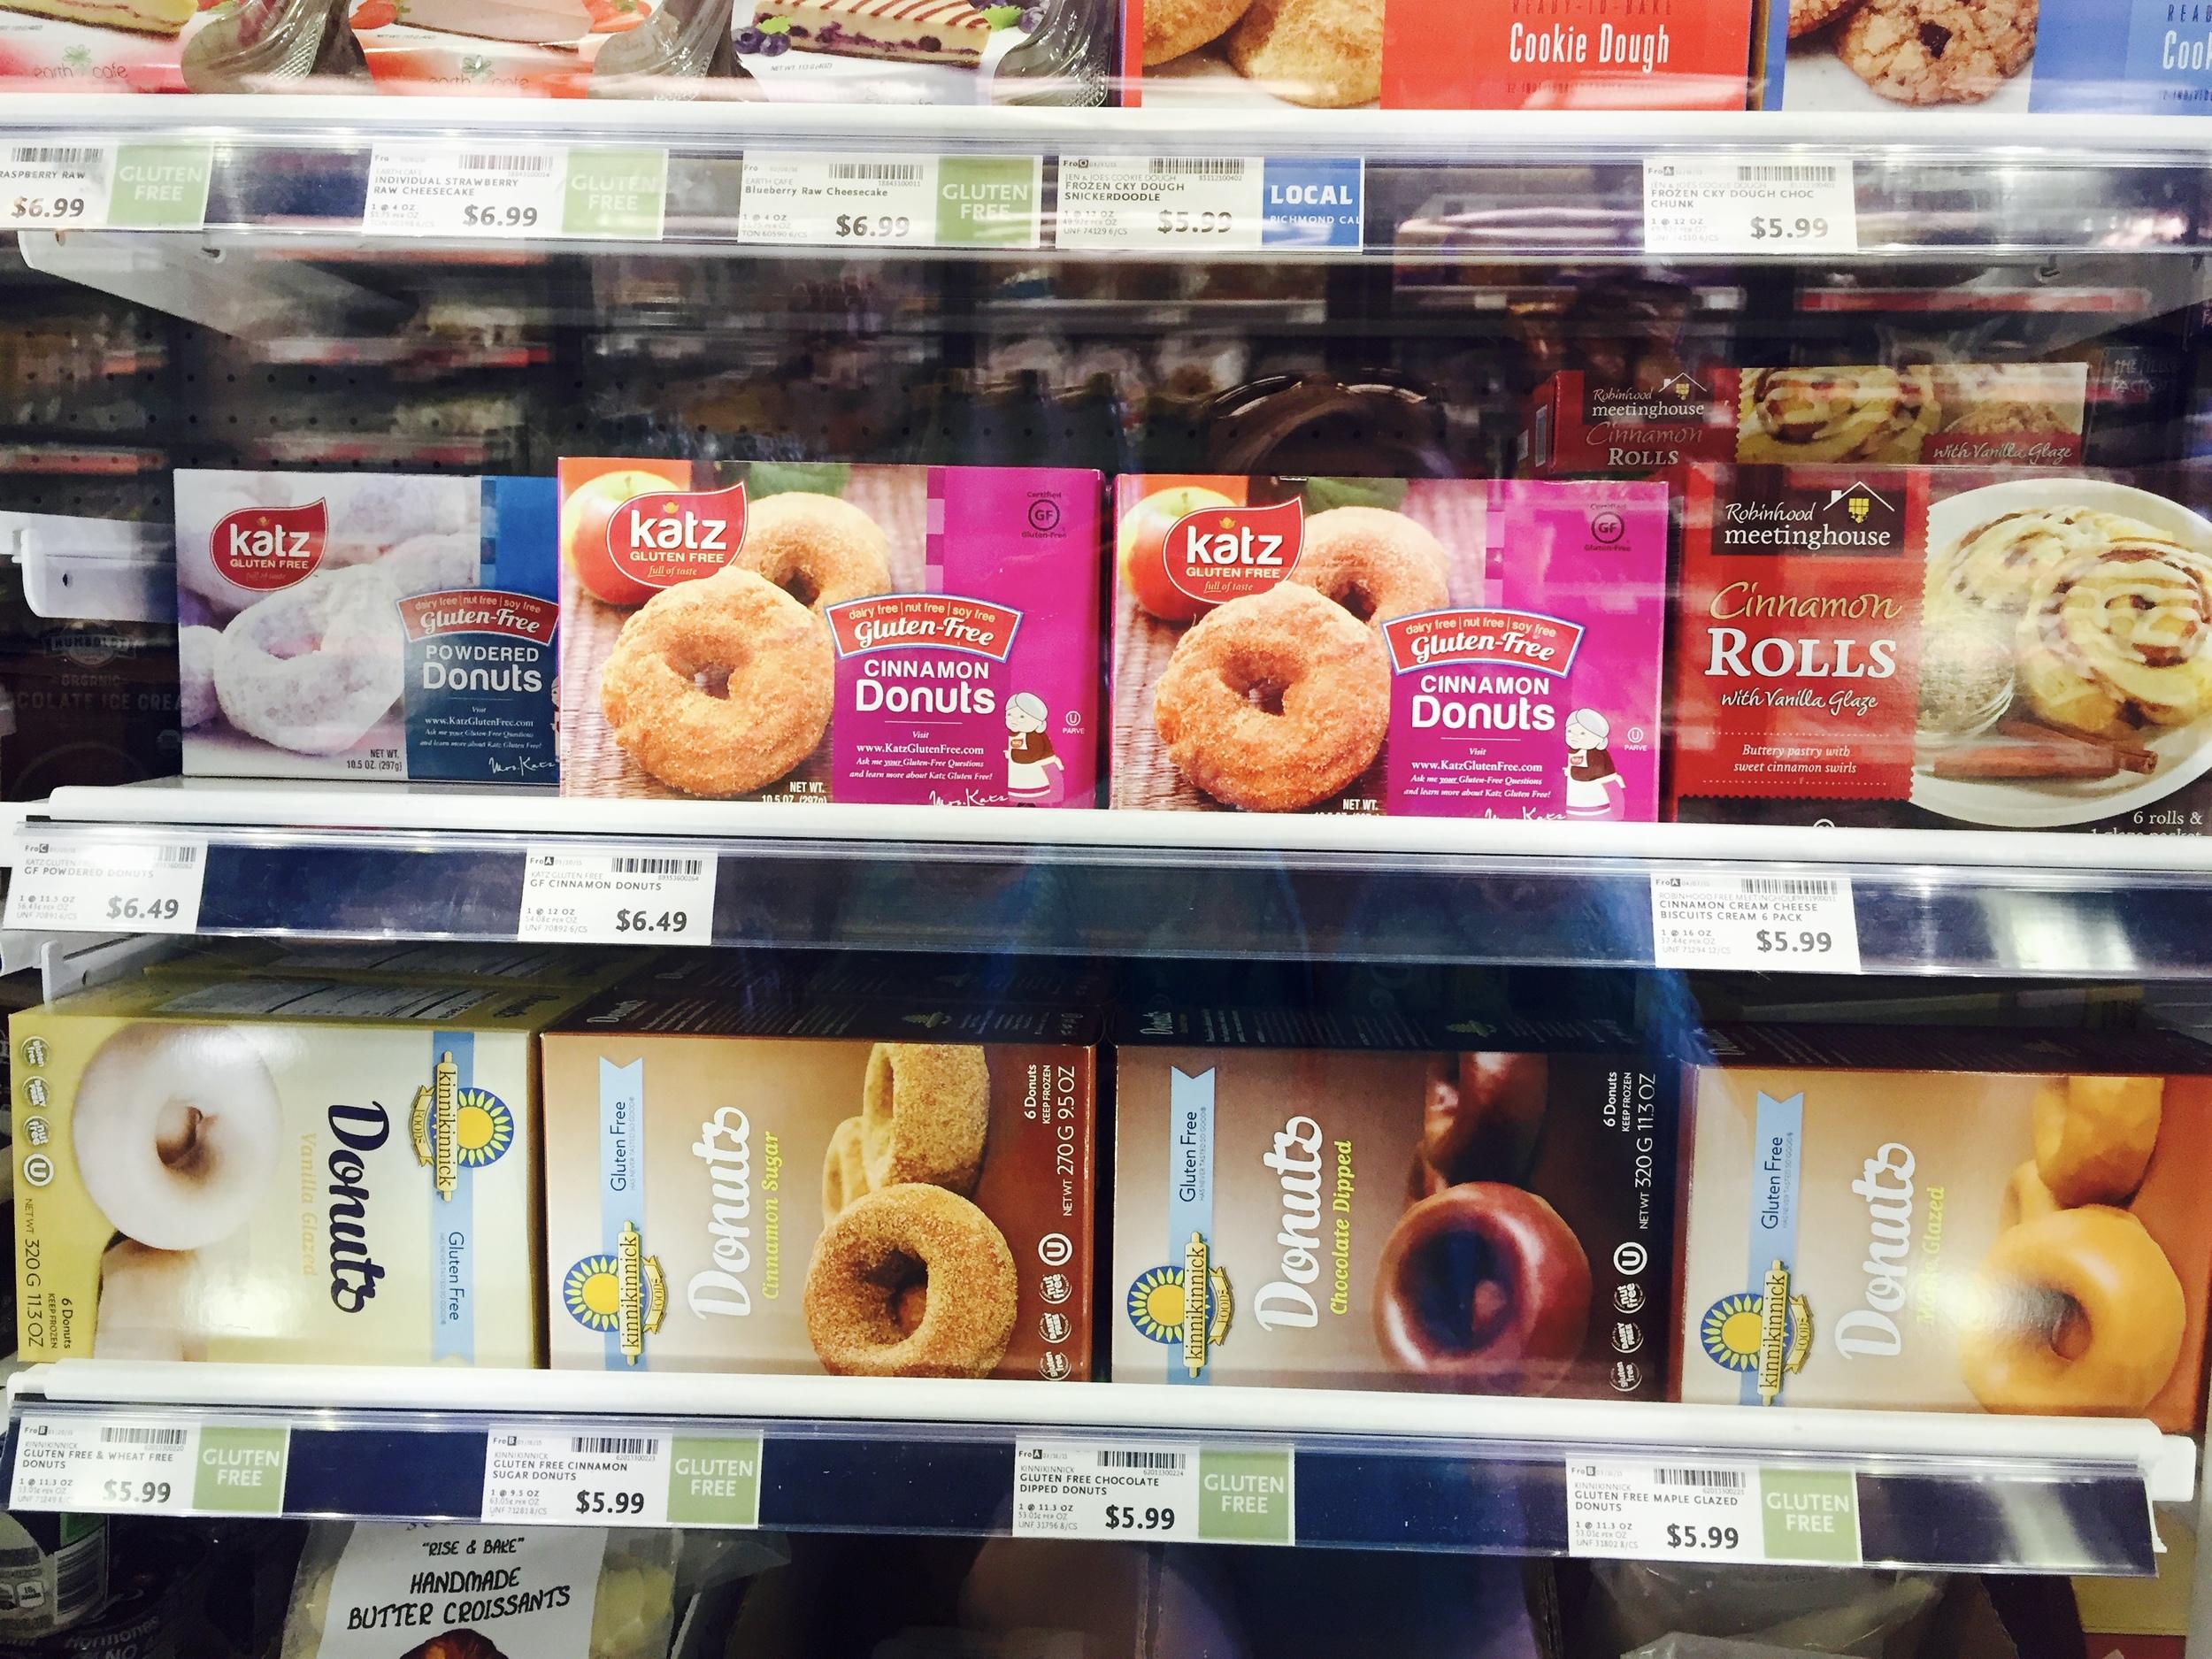 Donutsai be gliuteno